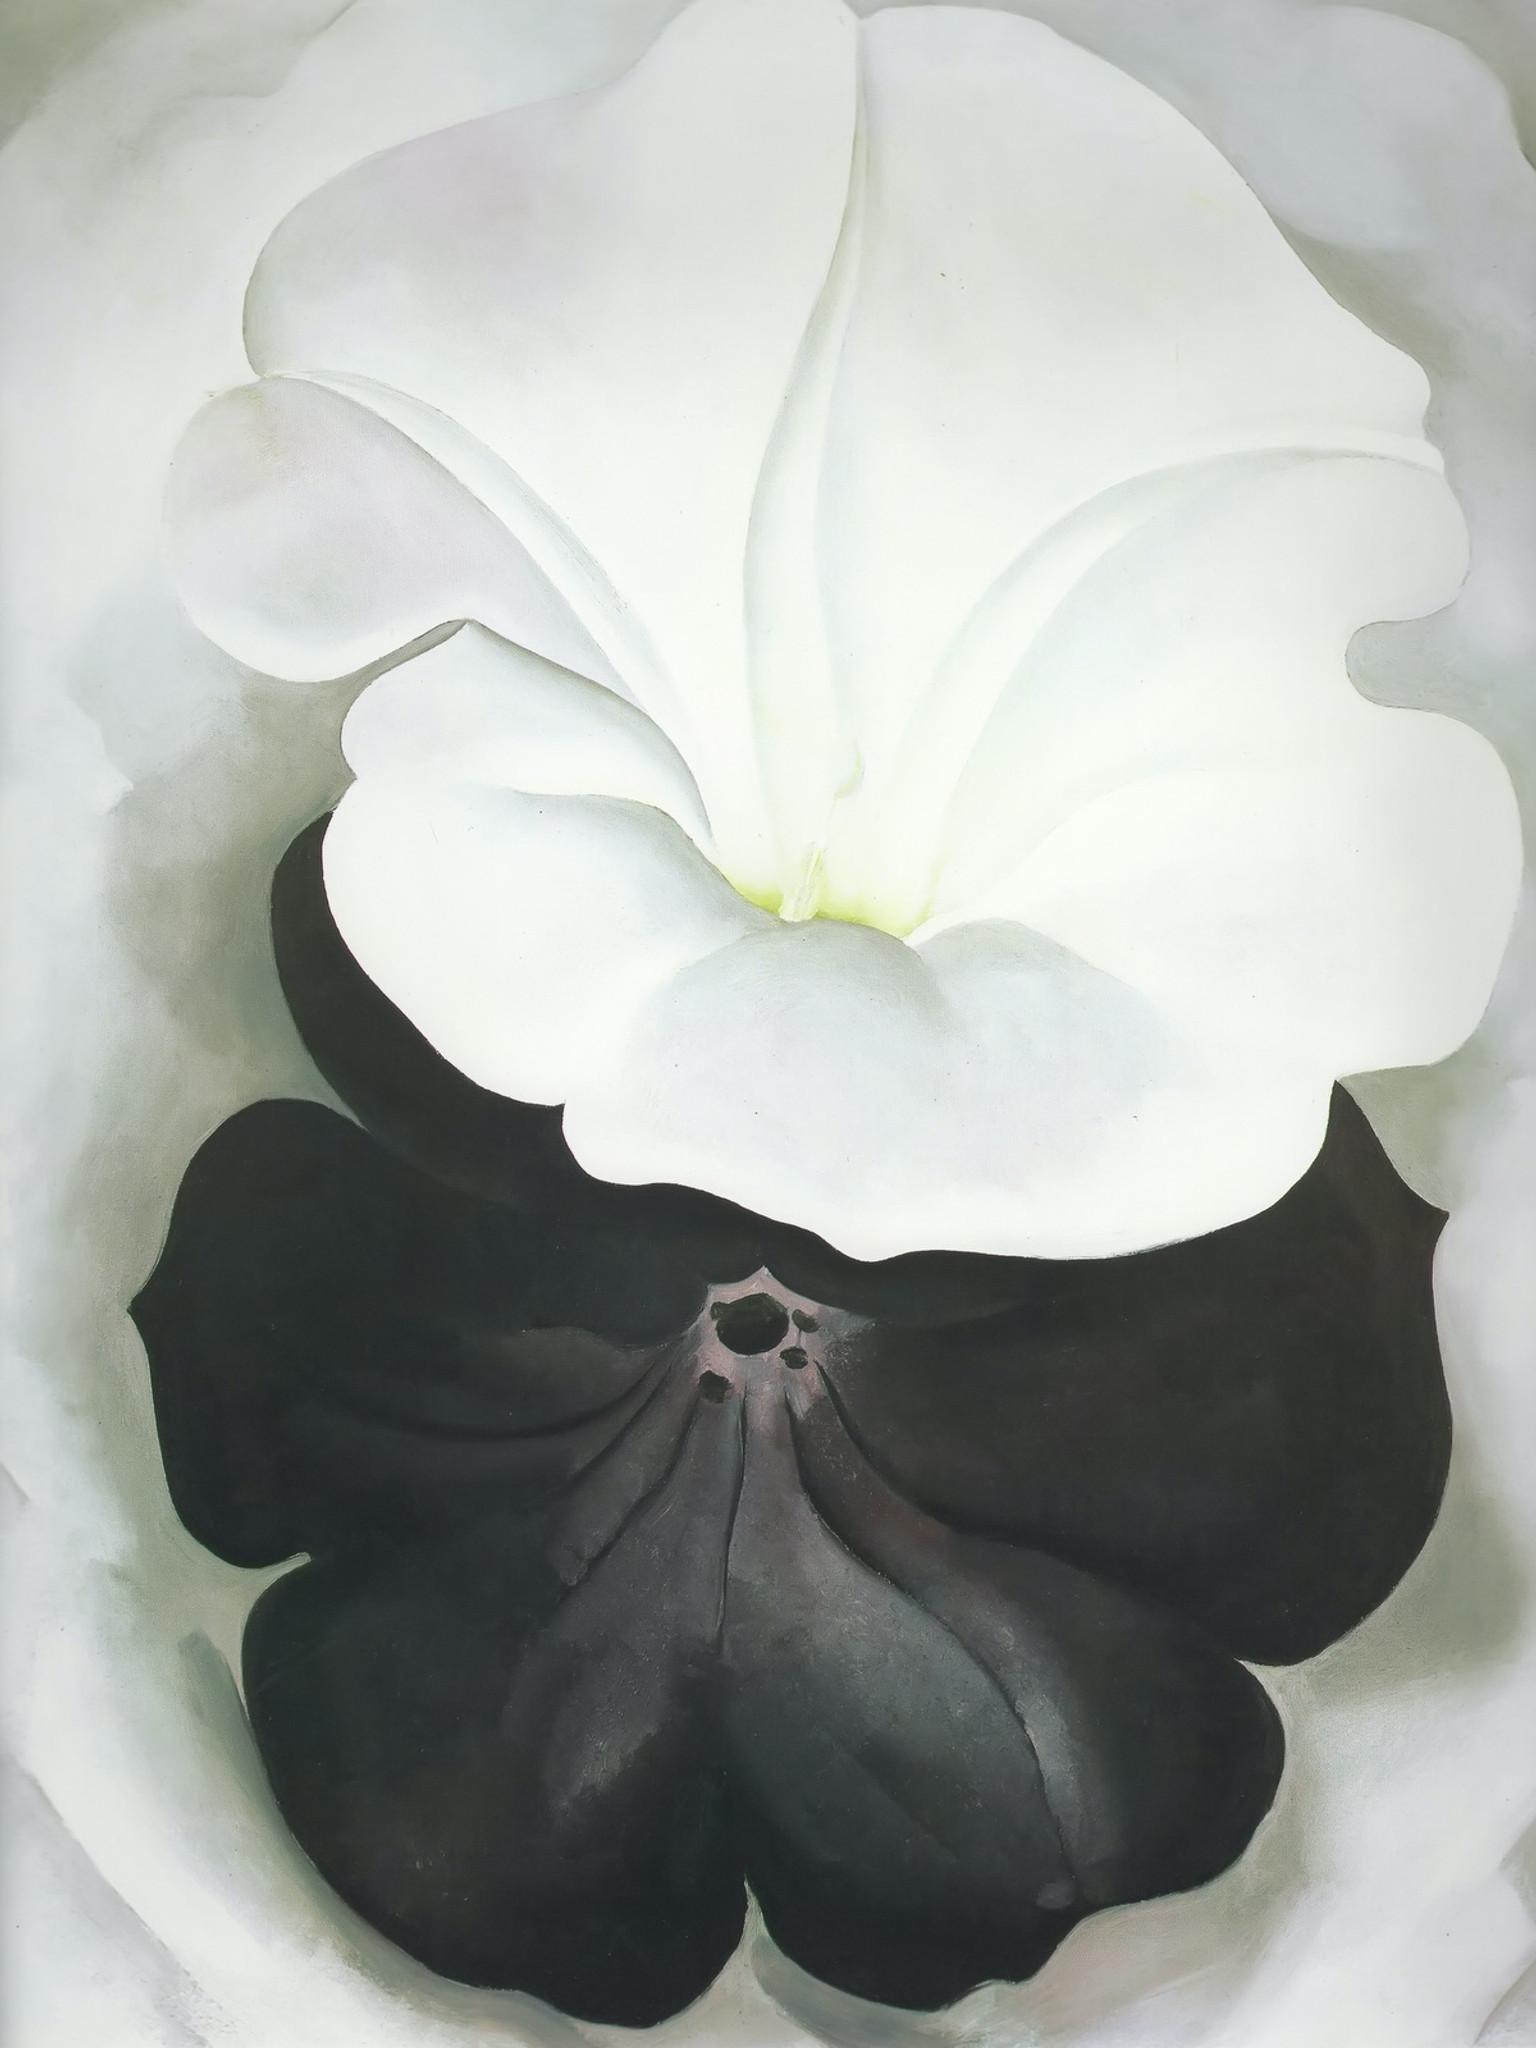 Black Petunia And White Morning Glory Ii By Georgia O Keeffe Print